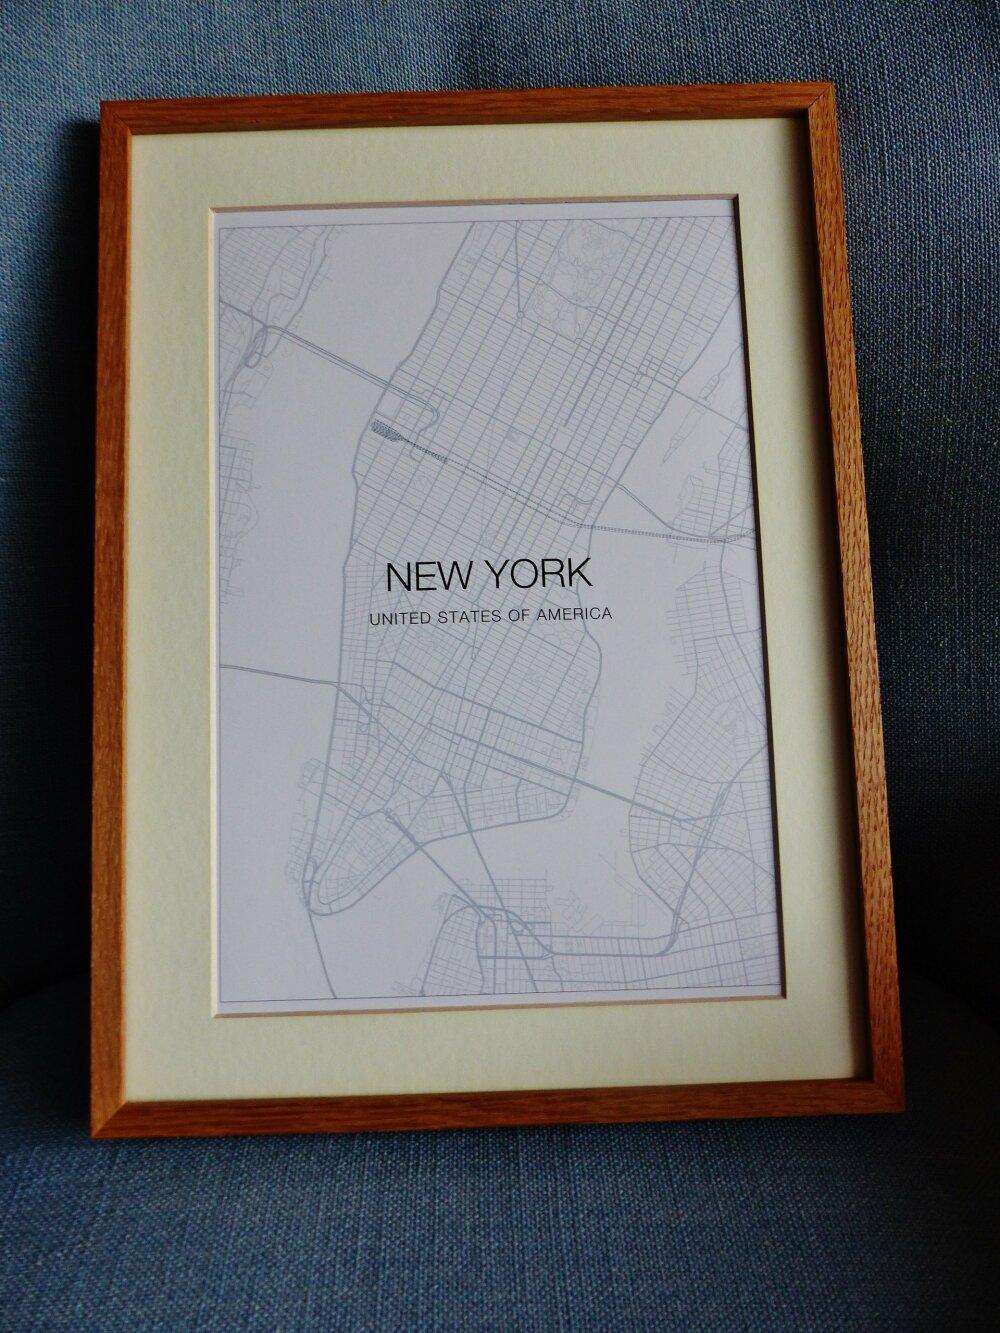 affiche A4  NEW YORK USA  plan de ville city map poster papier cartonné a encadrer